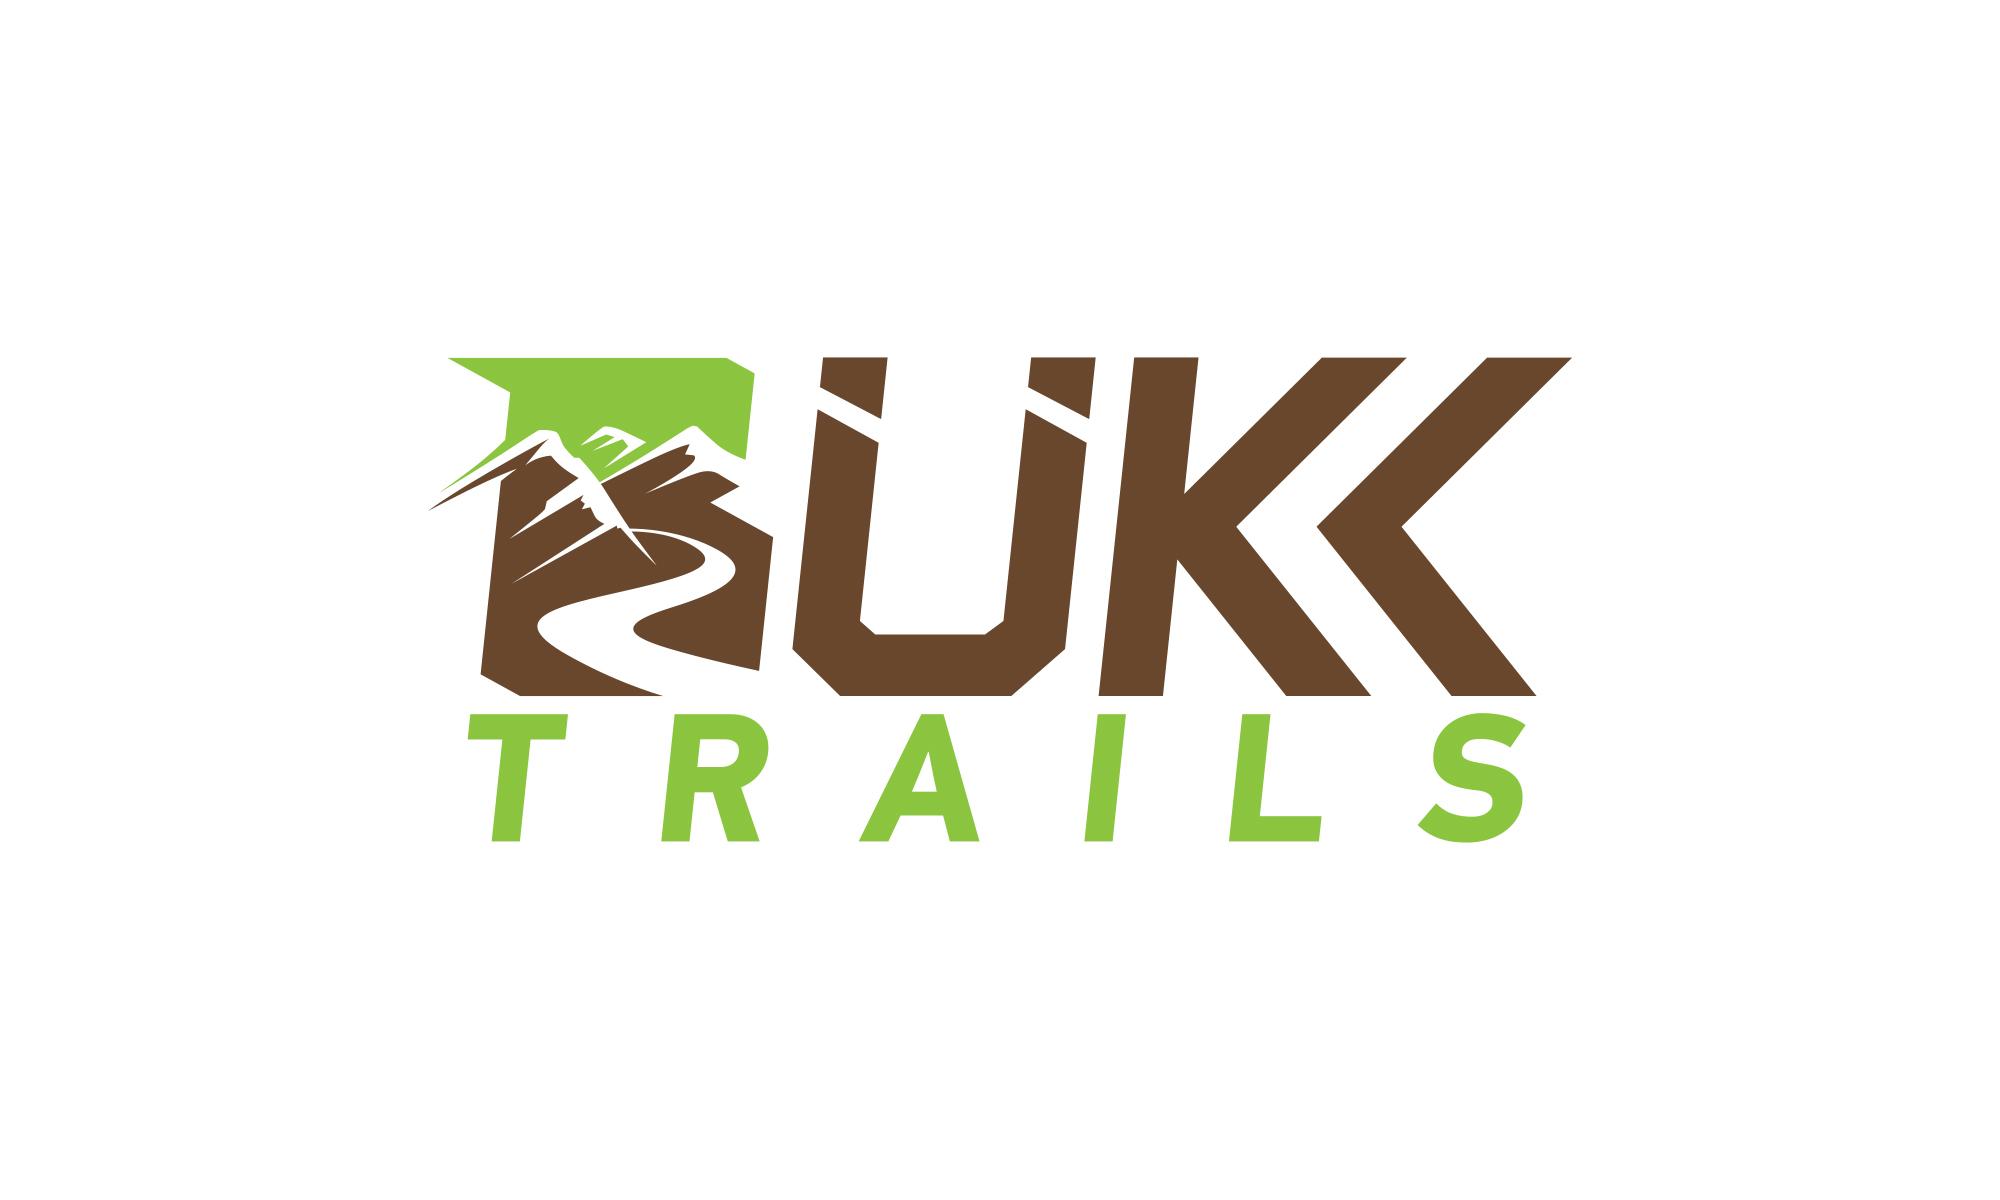 Bükk Trails logo